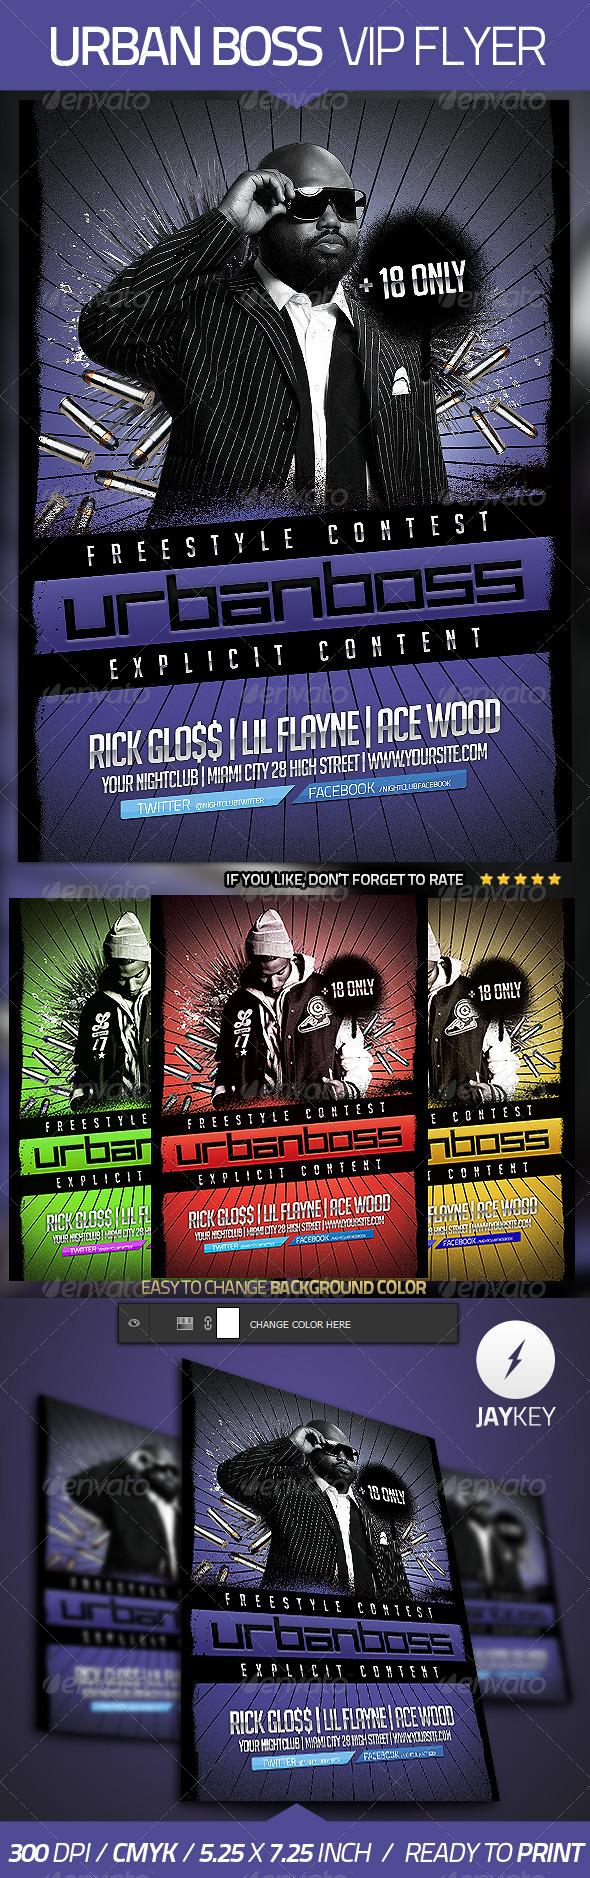 Urban Boss Flyer Template - Clubs & Parties Events